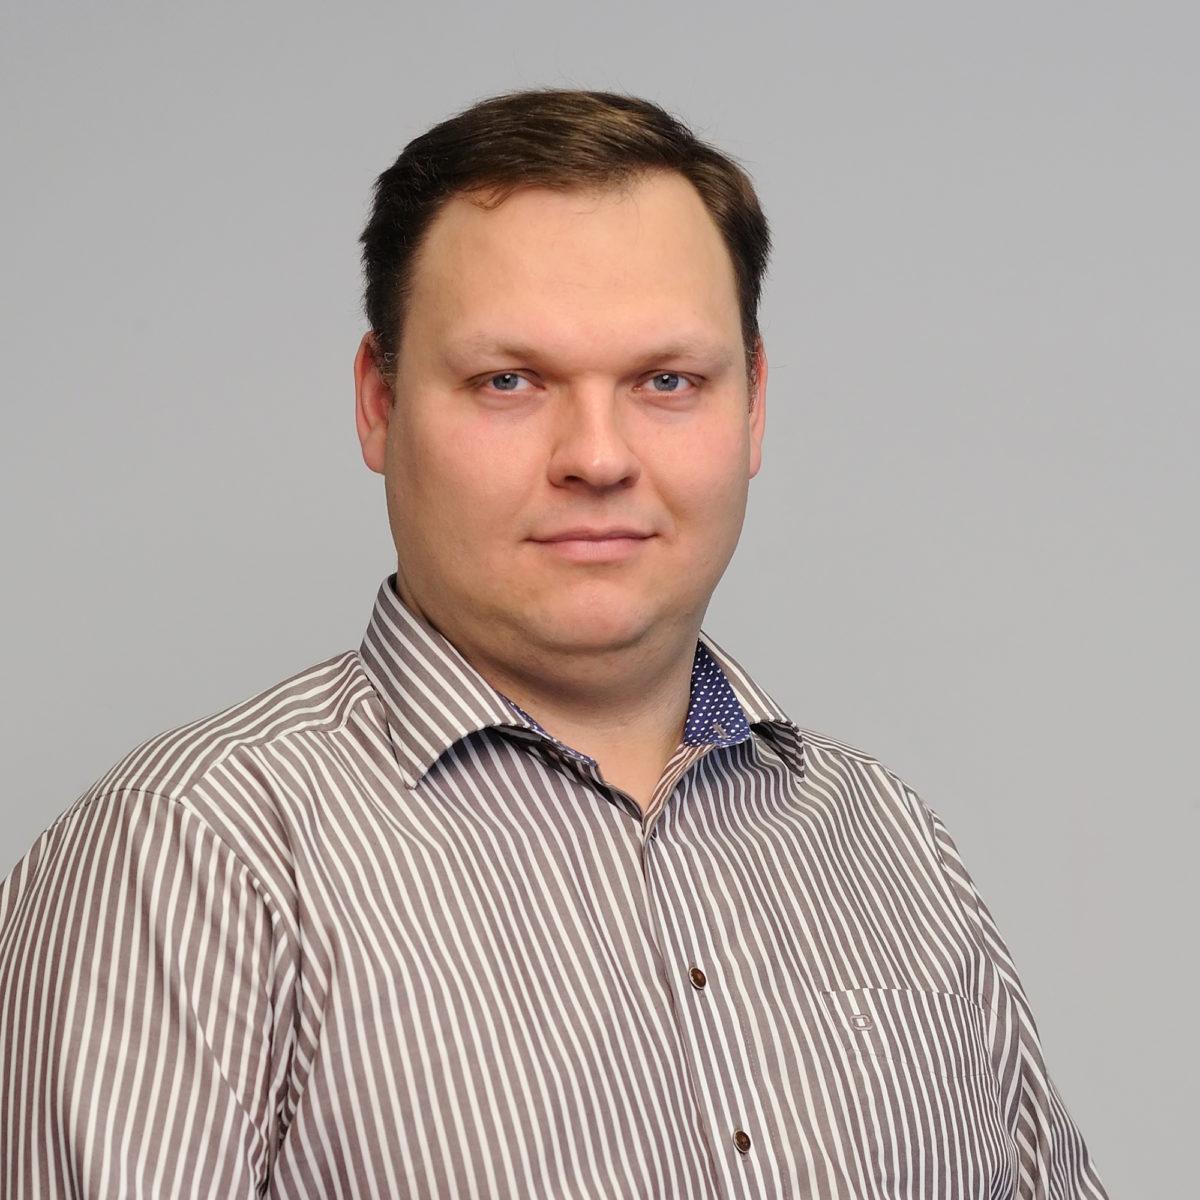 Мироненков Алексей Алексеевич